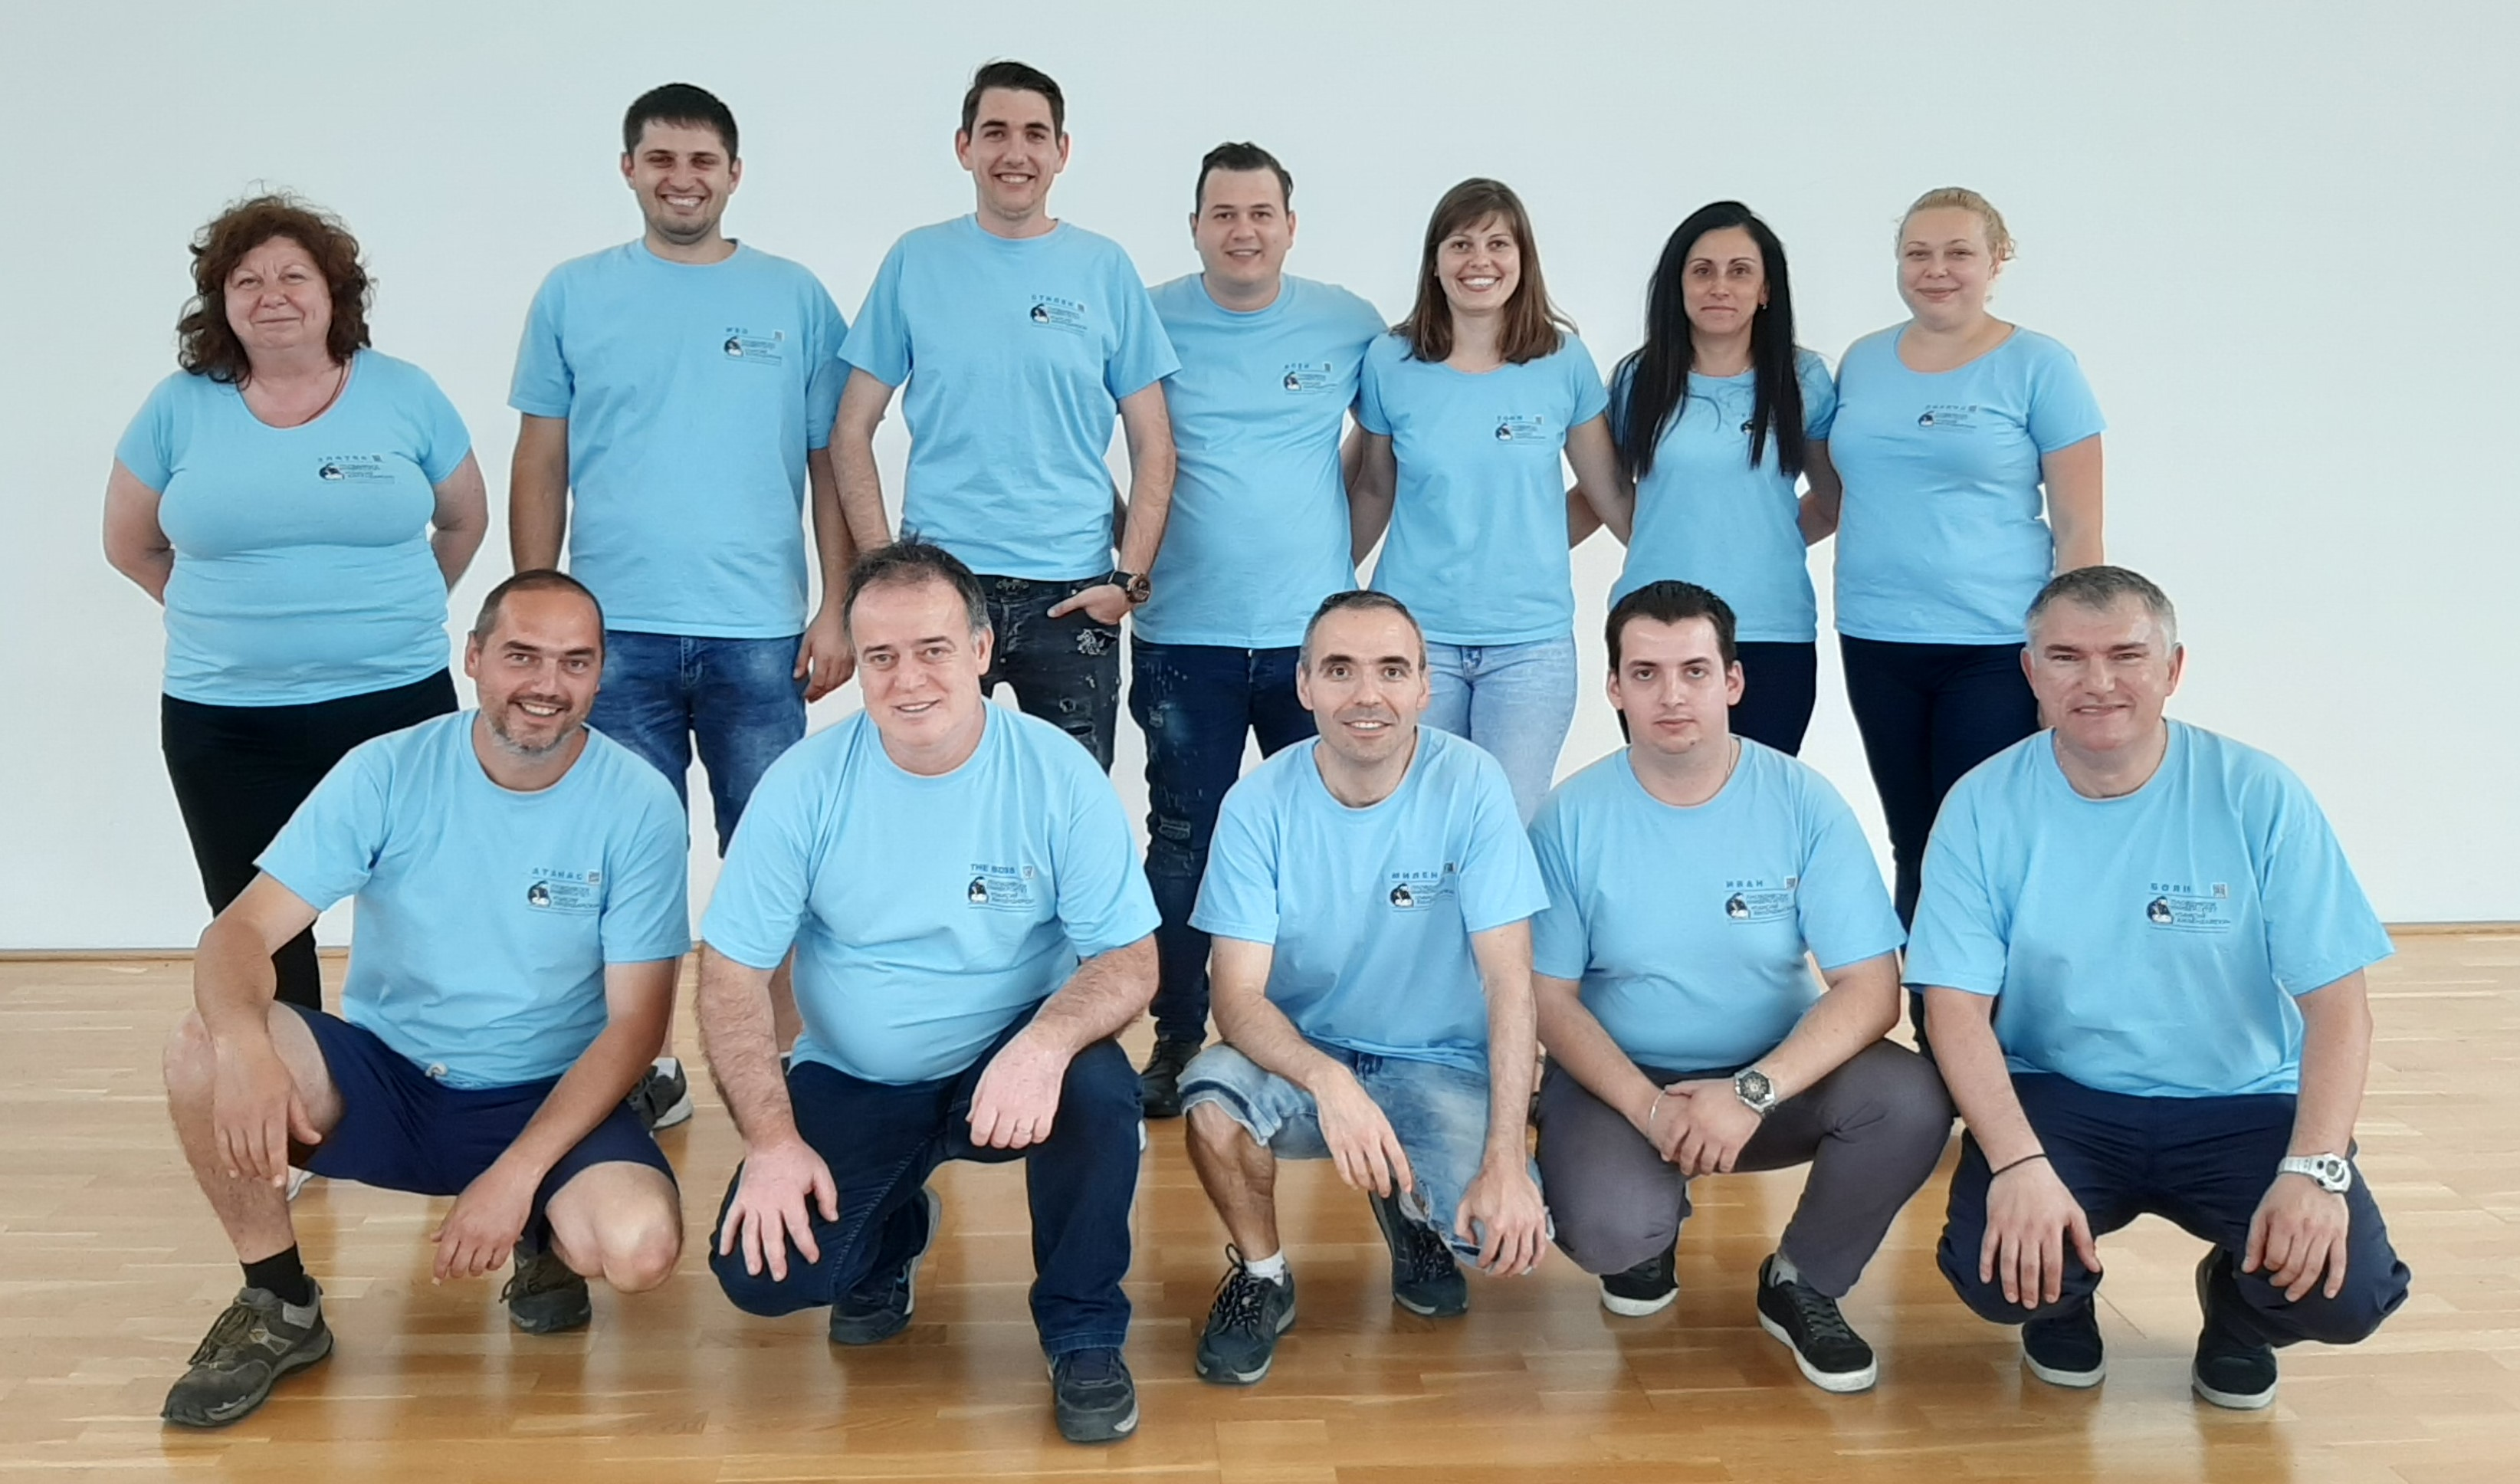 uic-team